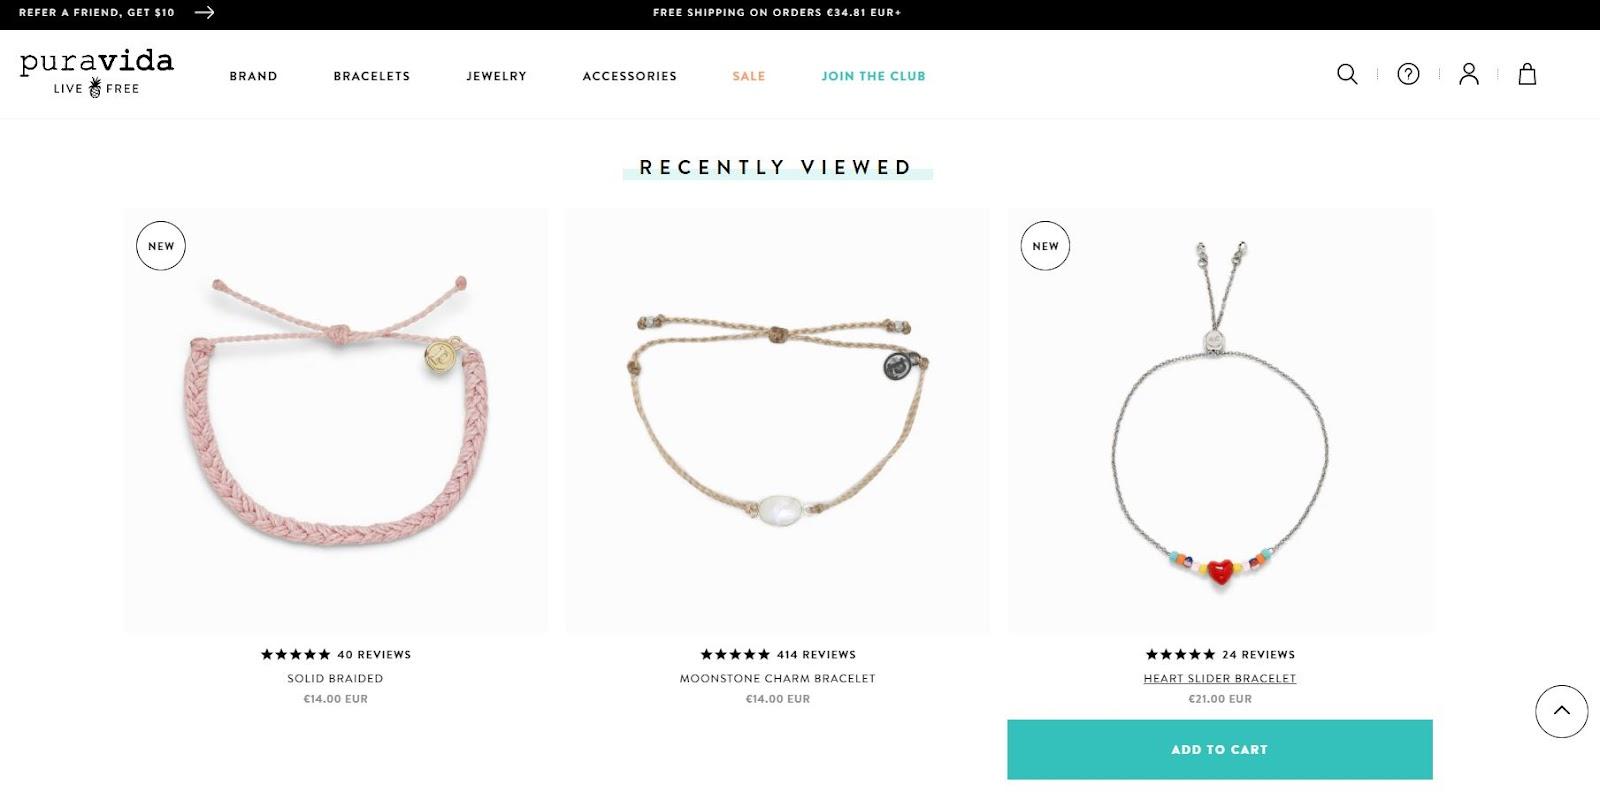 Pura Vida brand selling bracelets